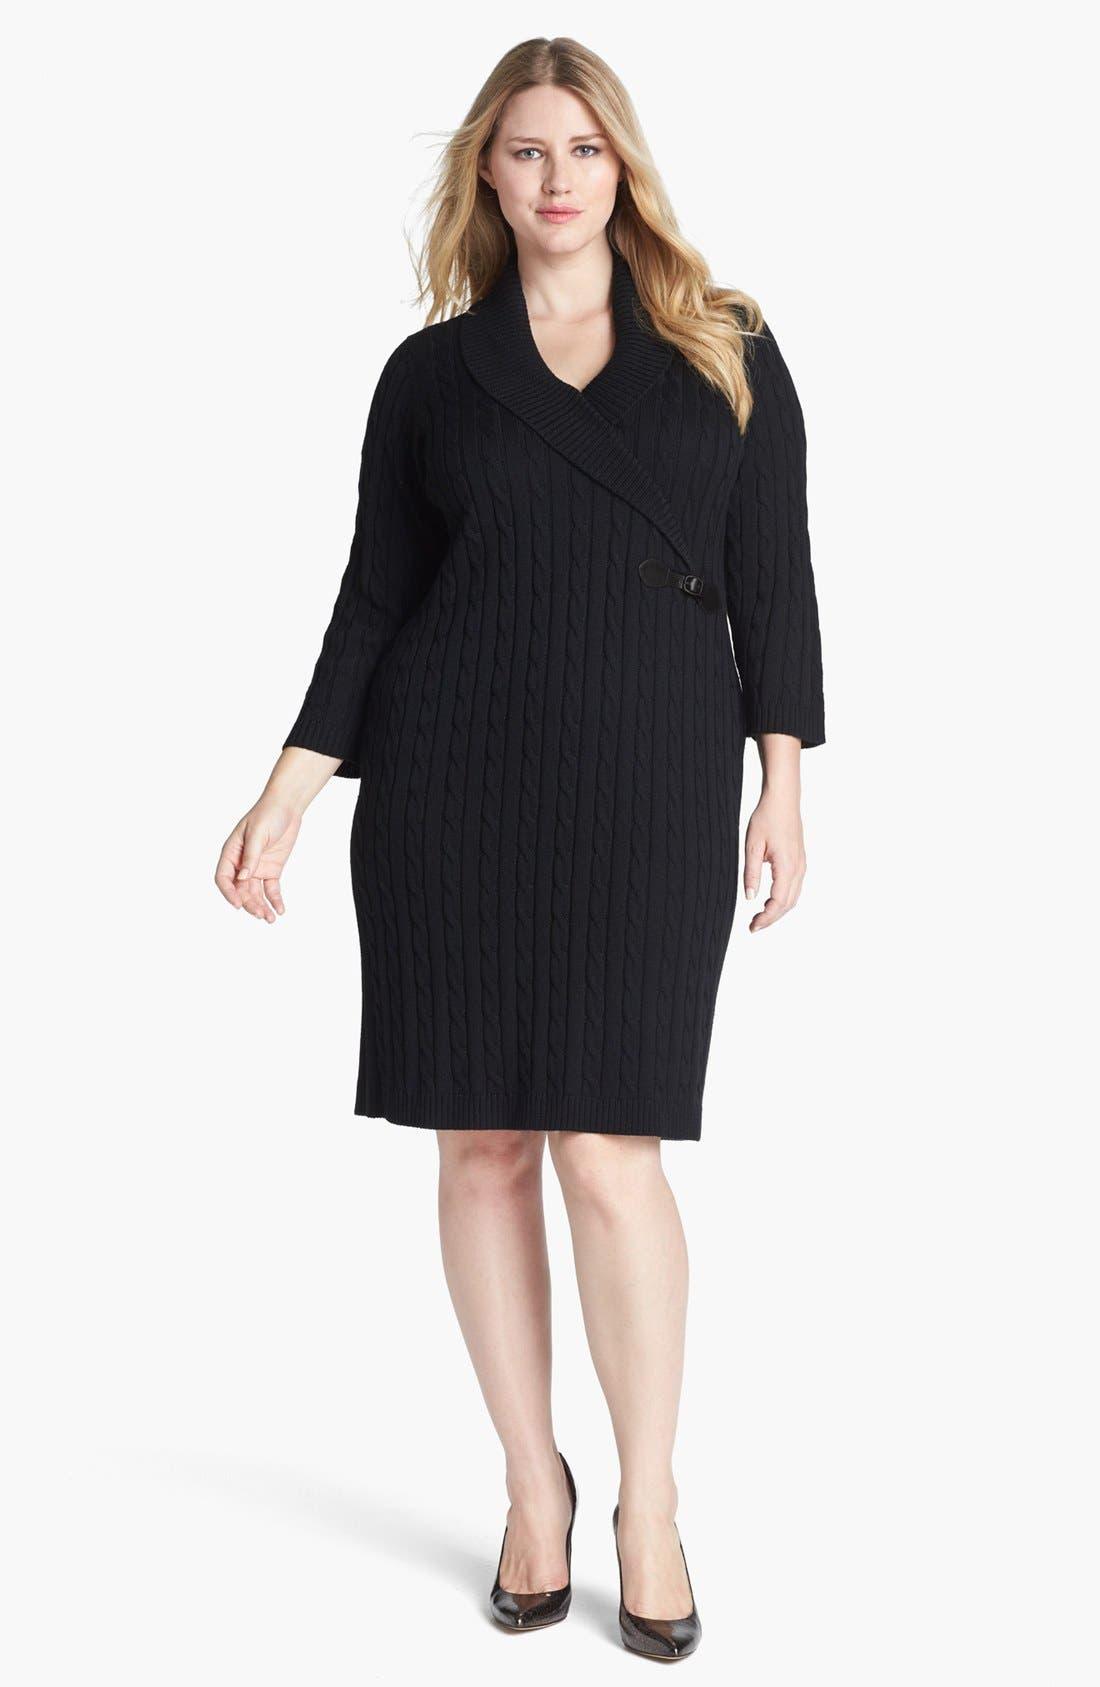 Alternate Image 1 Selected - Calvin Klein Faux Wrap Sweater Dress (Plus Size)